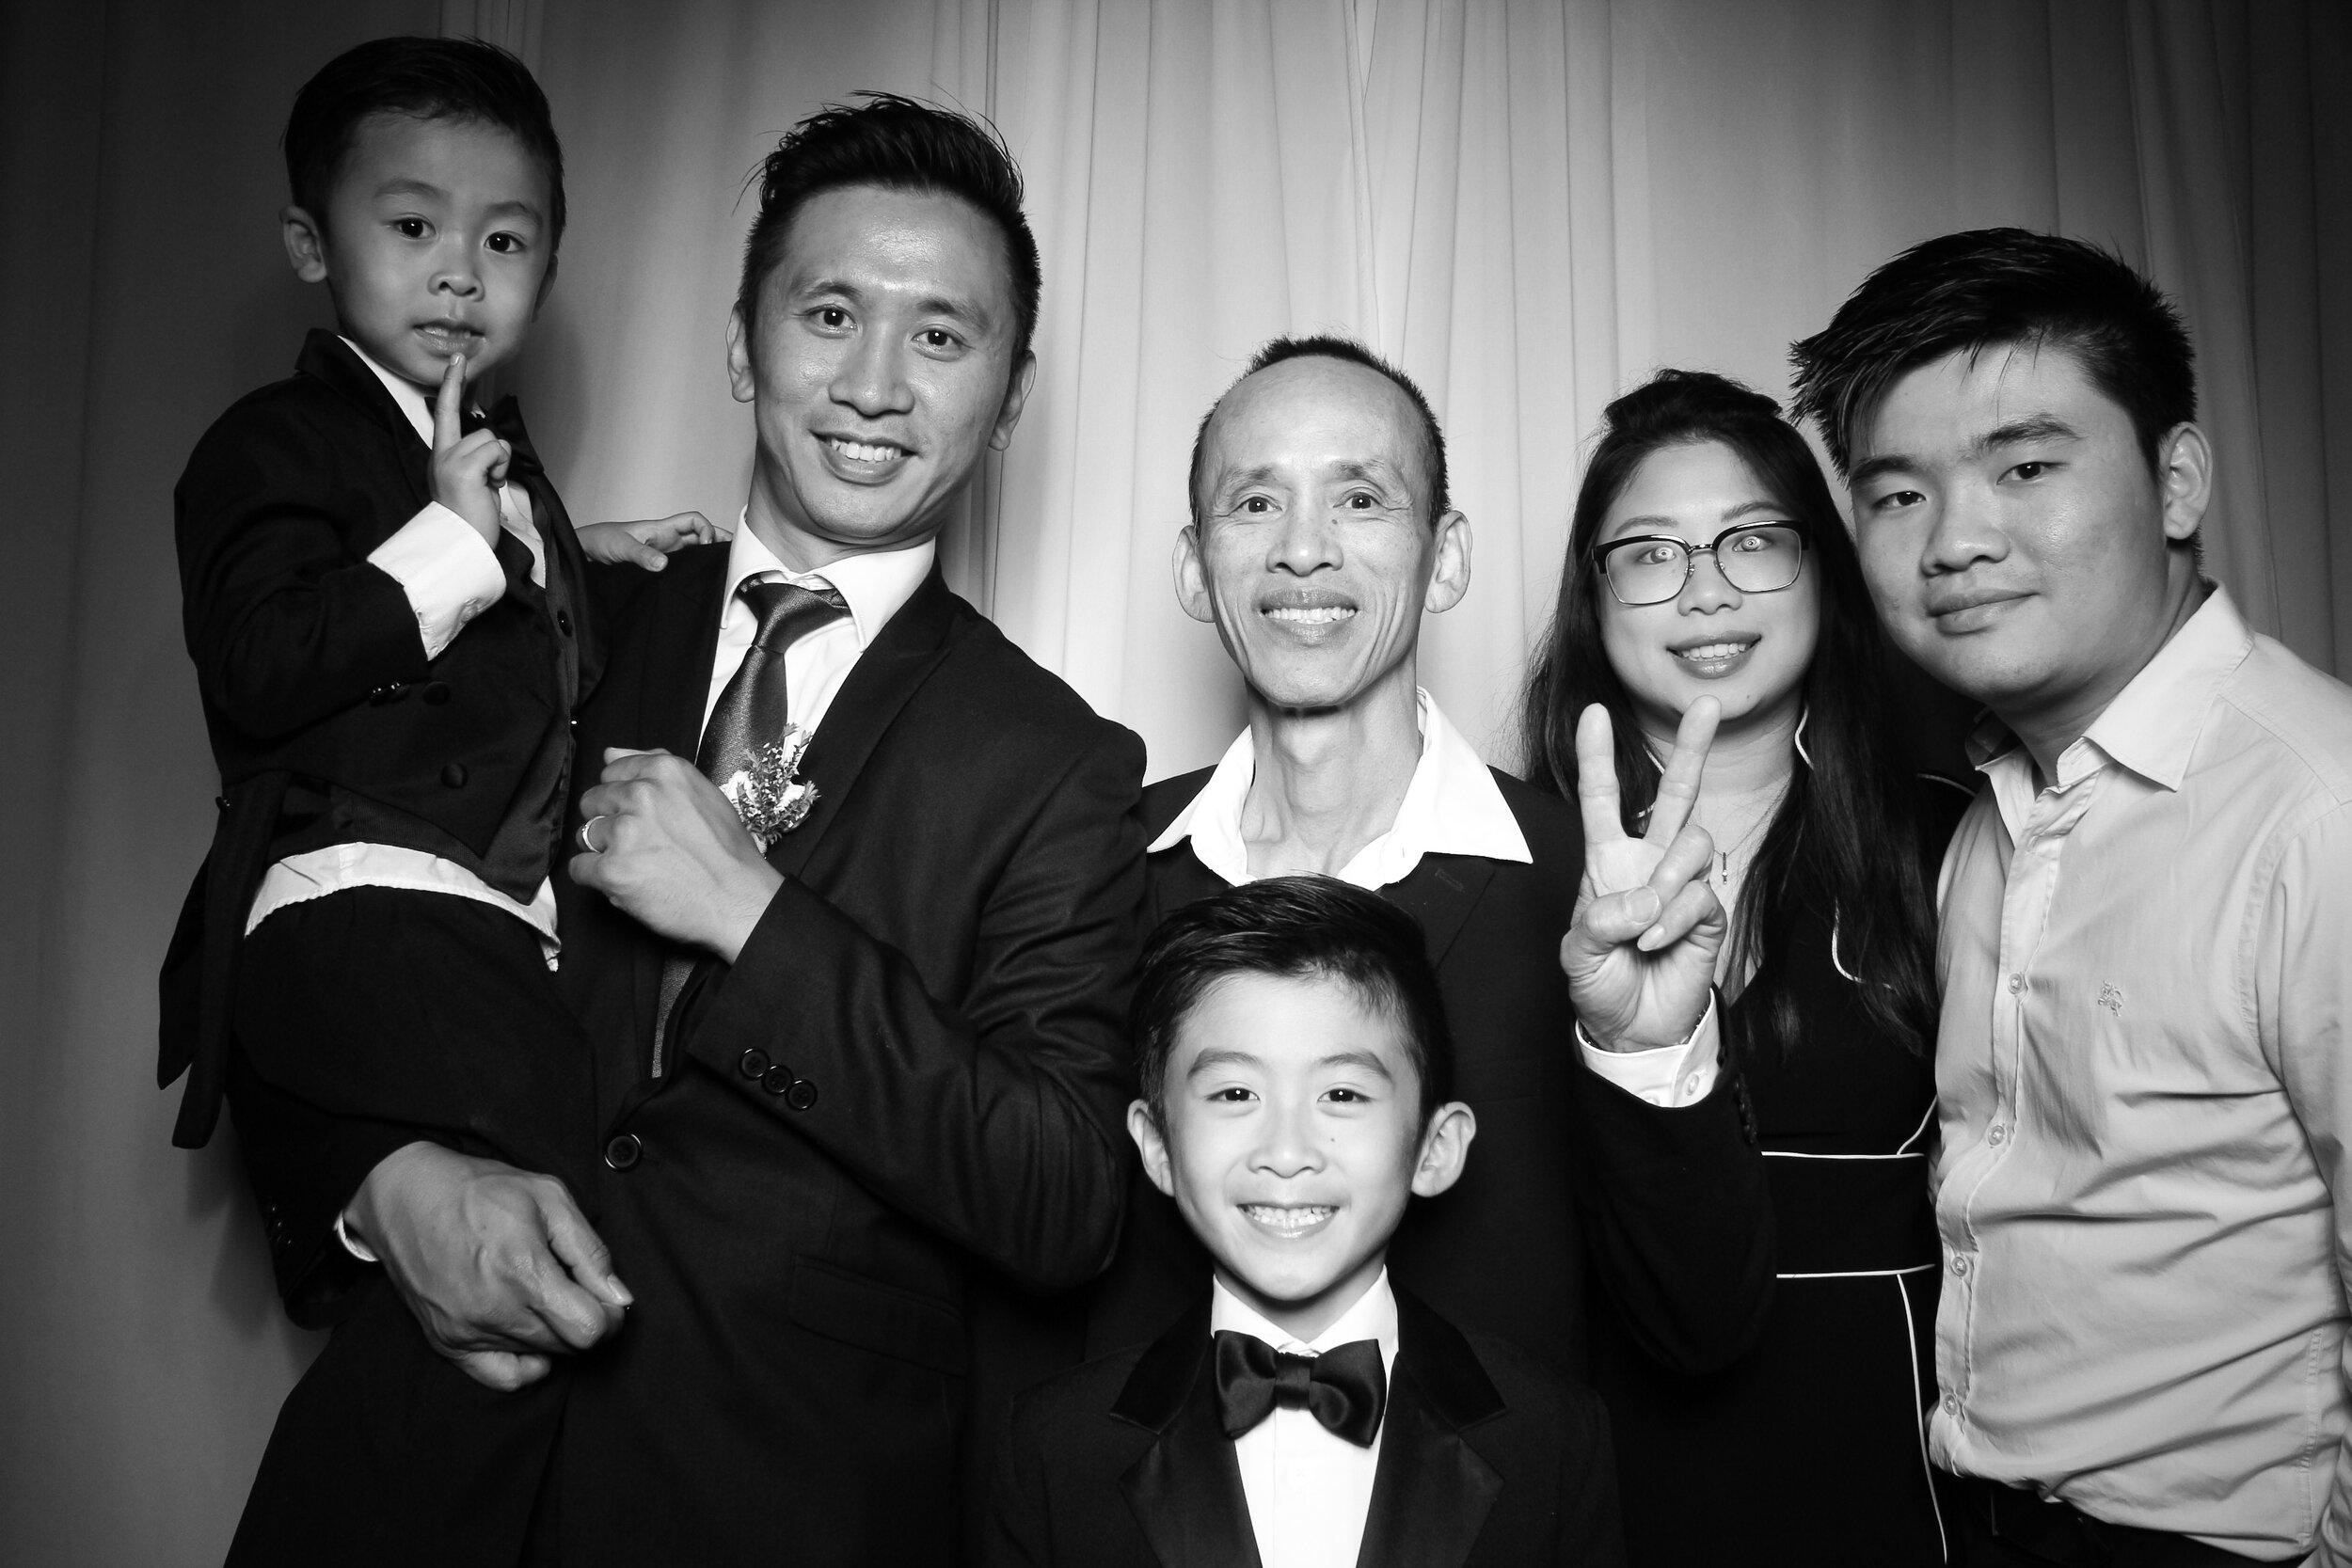 Cai_Restaurant_Chinatown_Chicago_Wedding_Photo_Booth_07.jpg